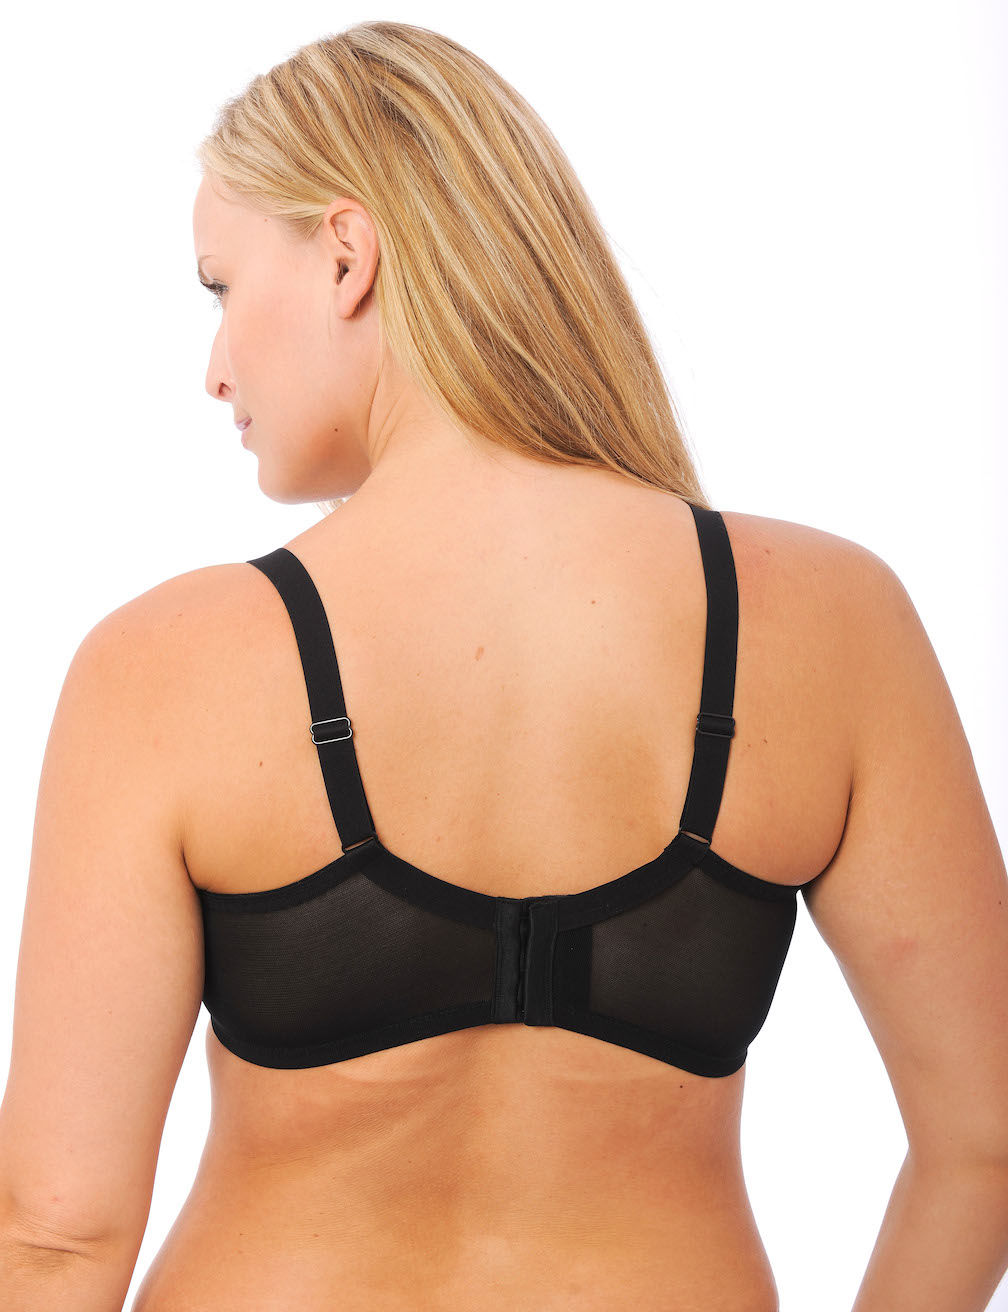 la-leche-league-smooth-cup-underwire-nursing-bra-4923-black-back.jpg